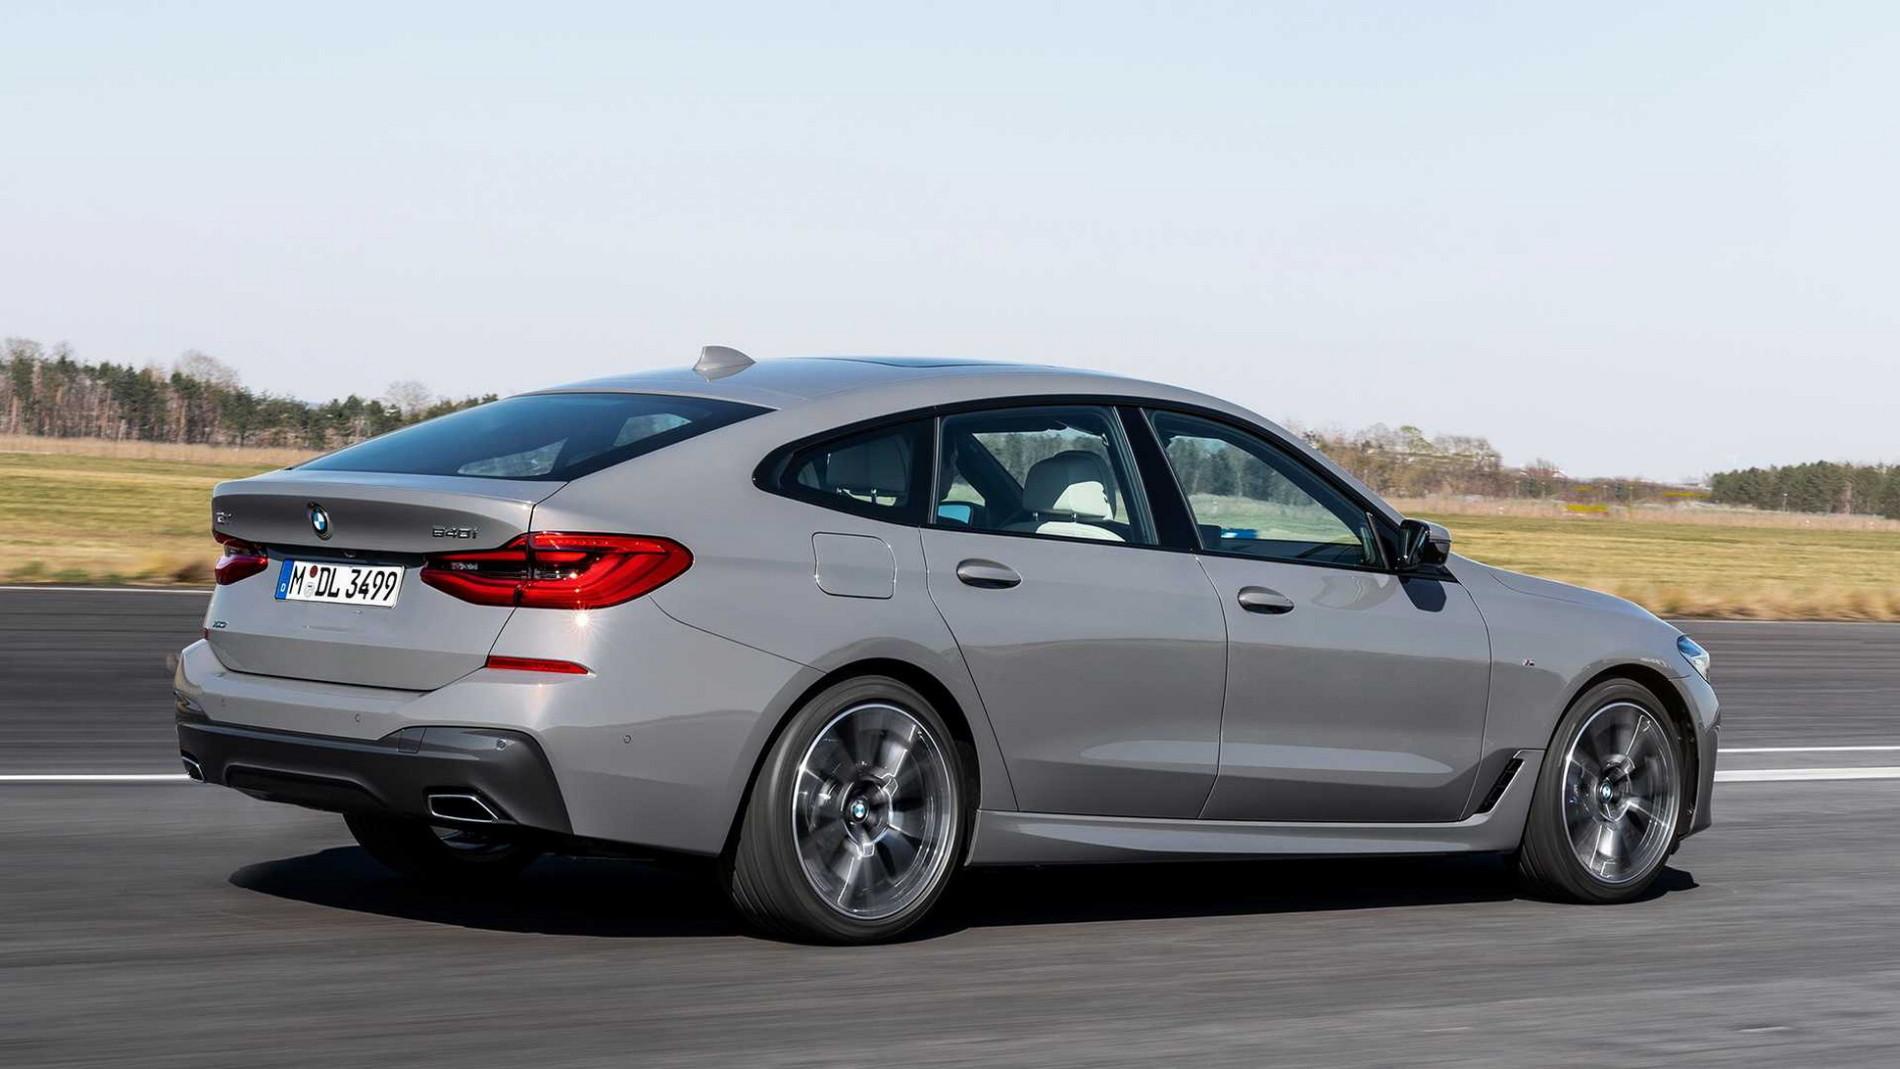 BMW Seria 6 GT Facelift - BMW Seria 6 GT Facelift